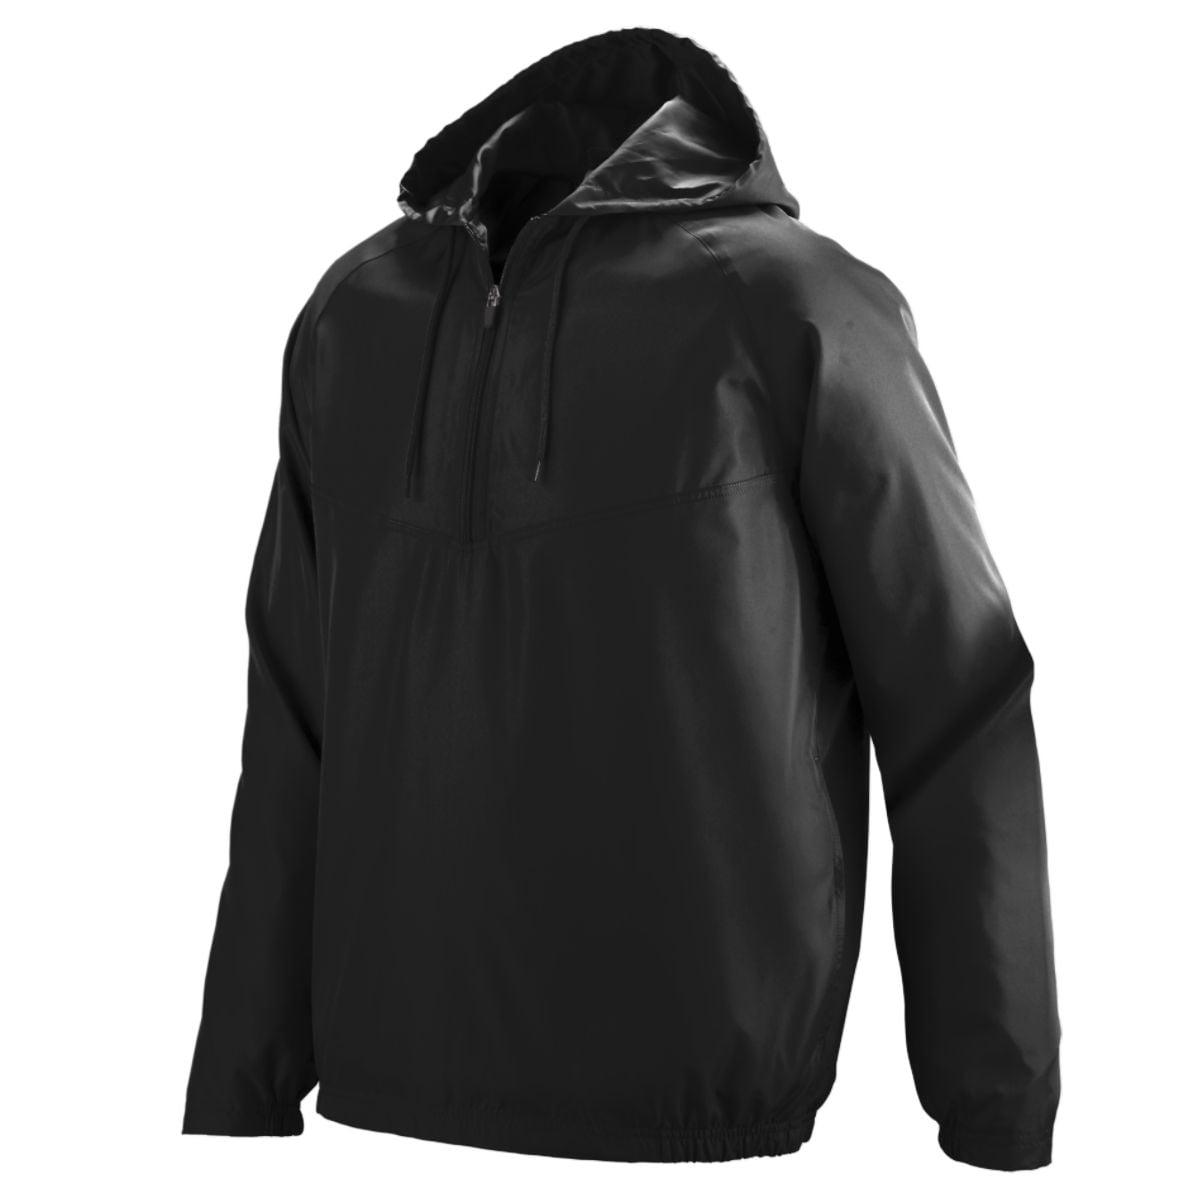 Augusta Avail Pullover Black 3Xl - image 1 de 1